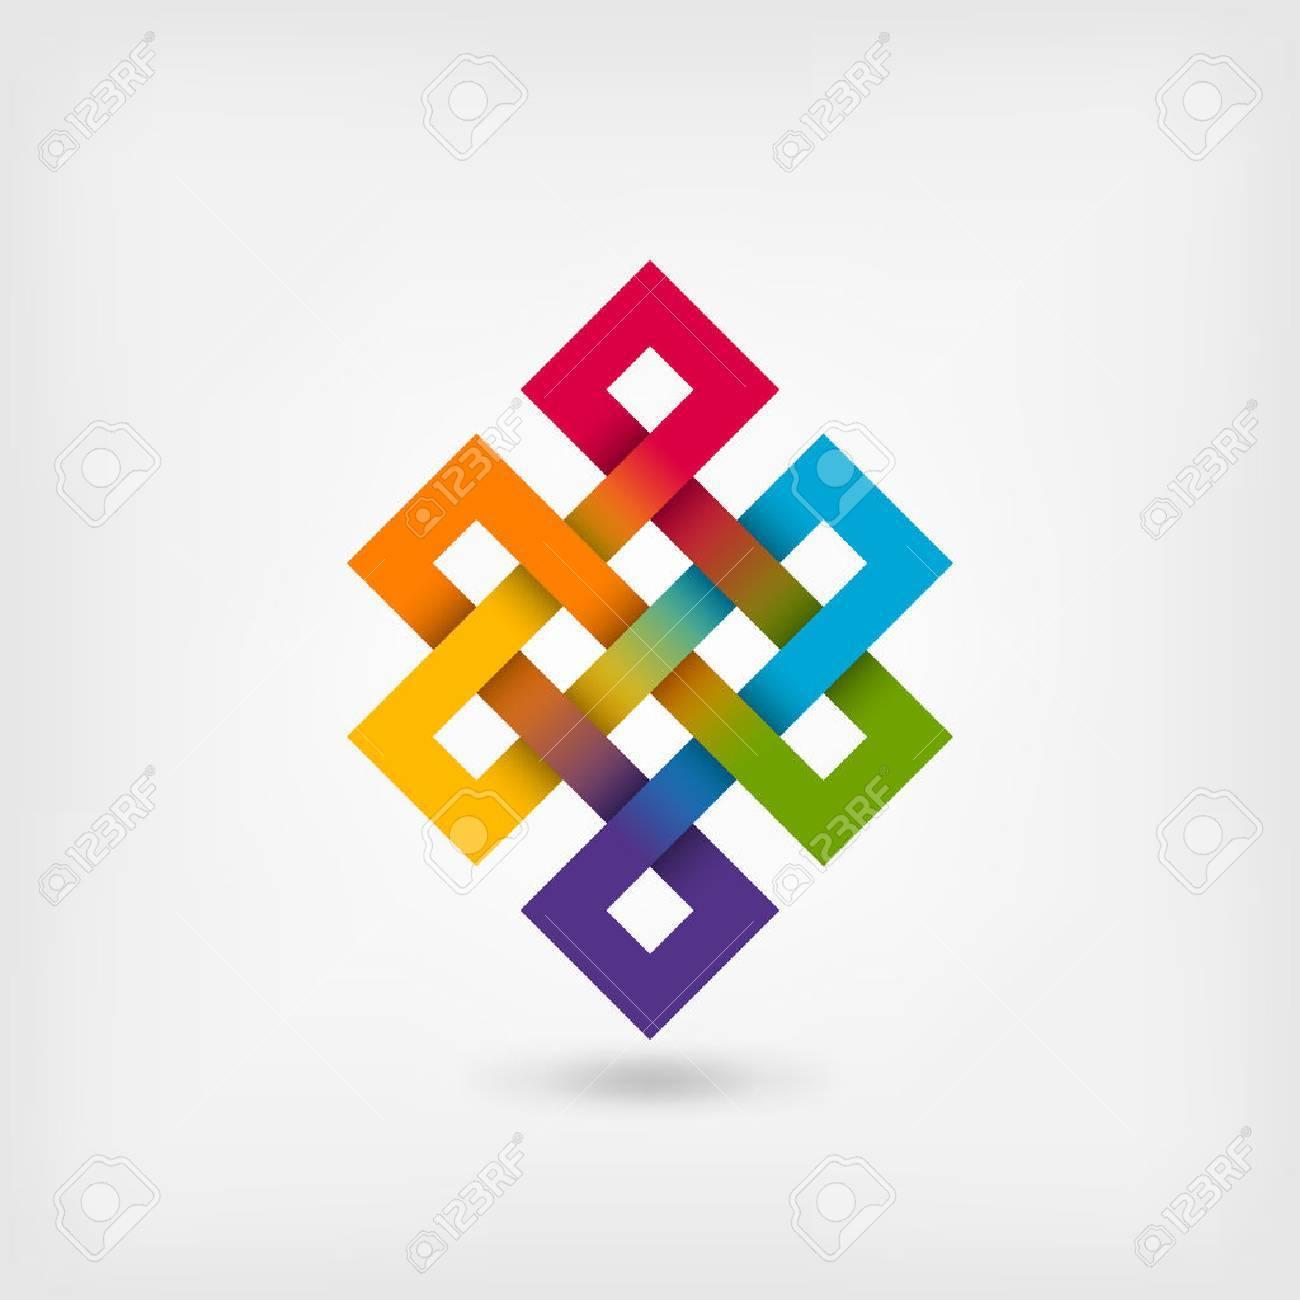 Shrivatsa endless knot in rainbow colors. vector illustration - eps 10 - 77255316